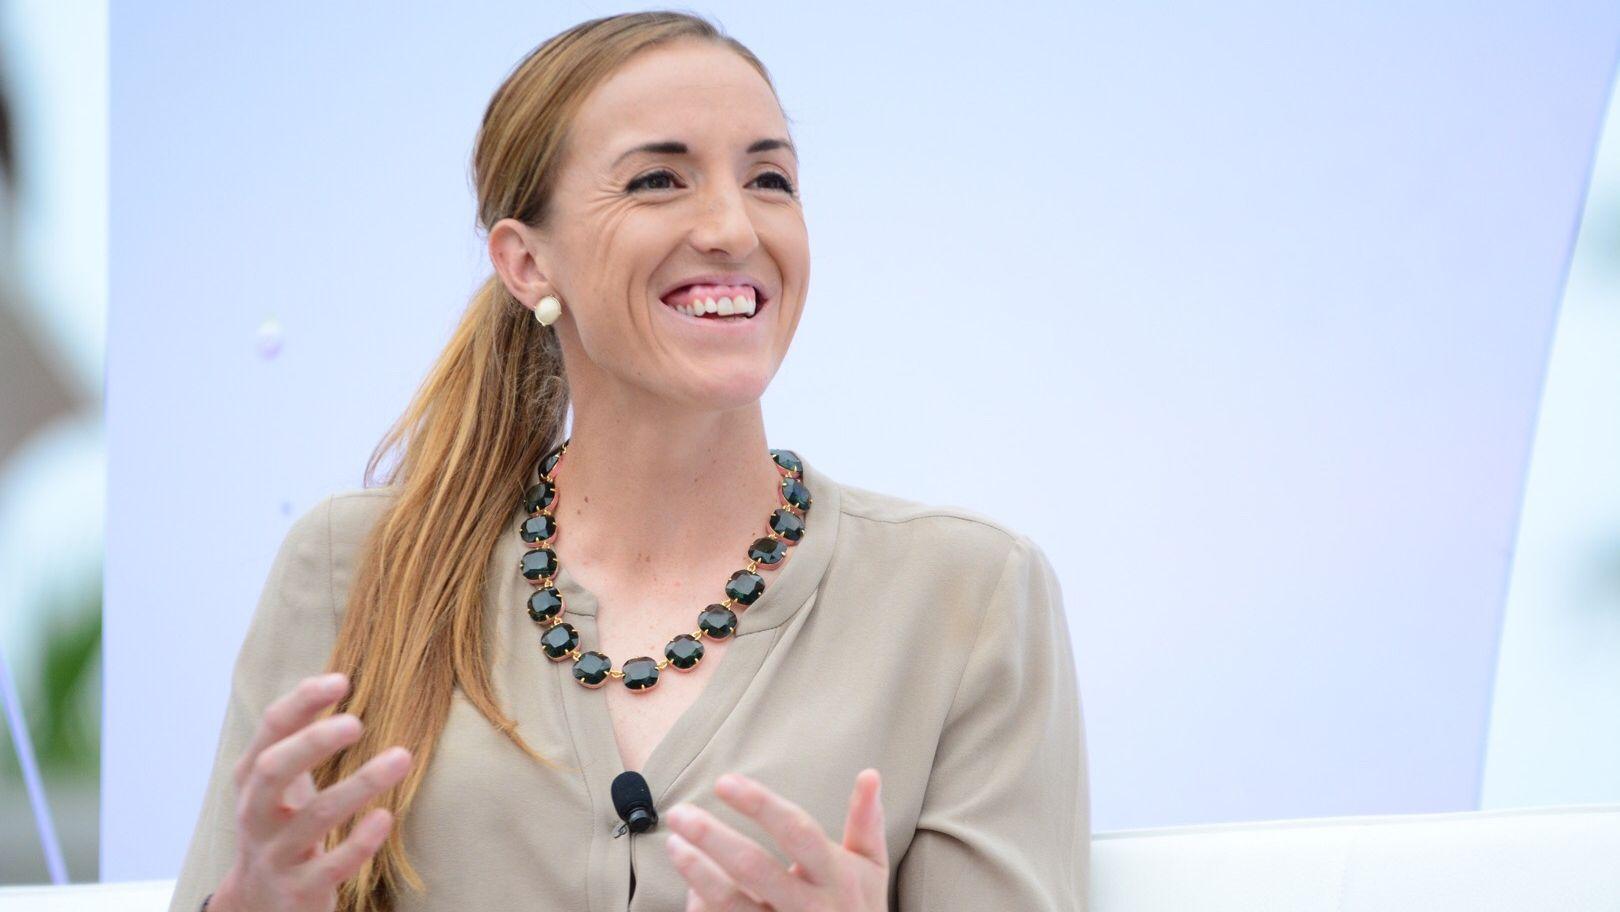 Monica Abbott looks ahead to Tokyo Olympics at espnW Summit